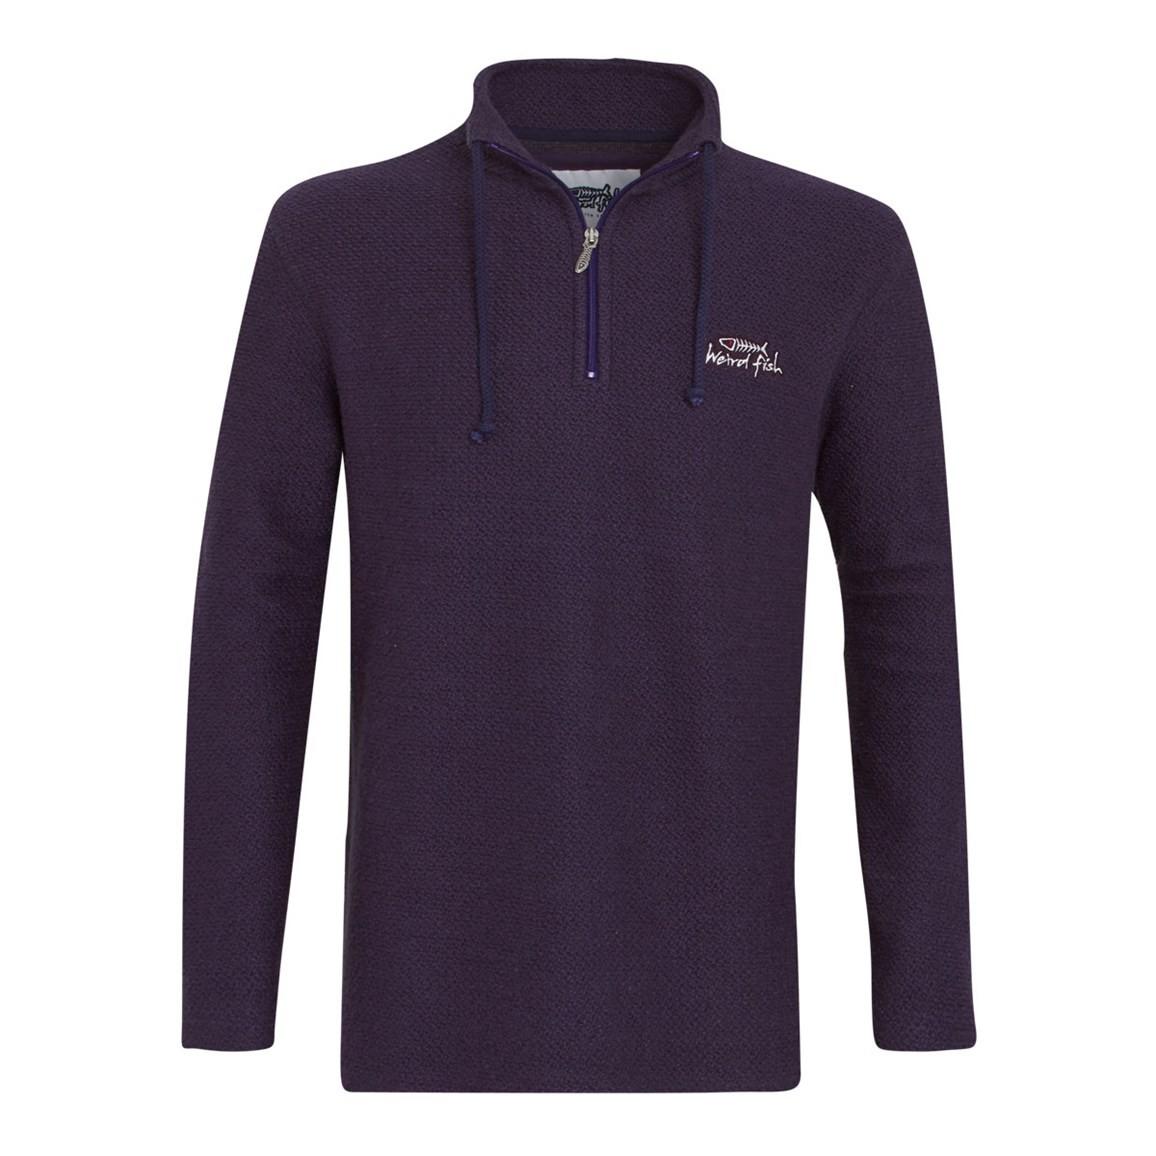 Image of Weird Fish Cruiser 1/4 Zip Classic Macaroni Sweatshirt Purple Size XL